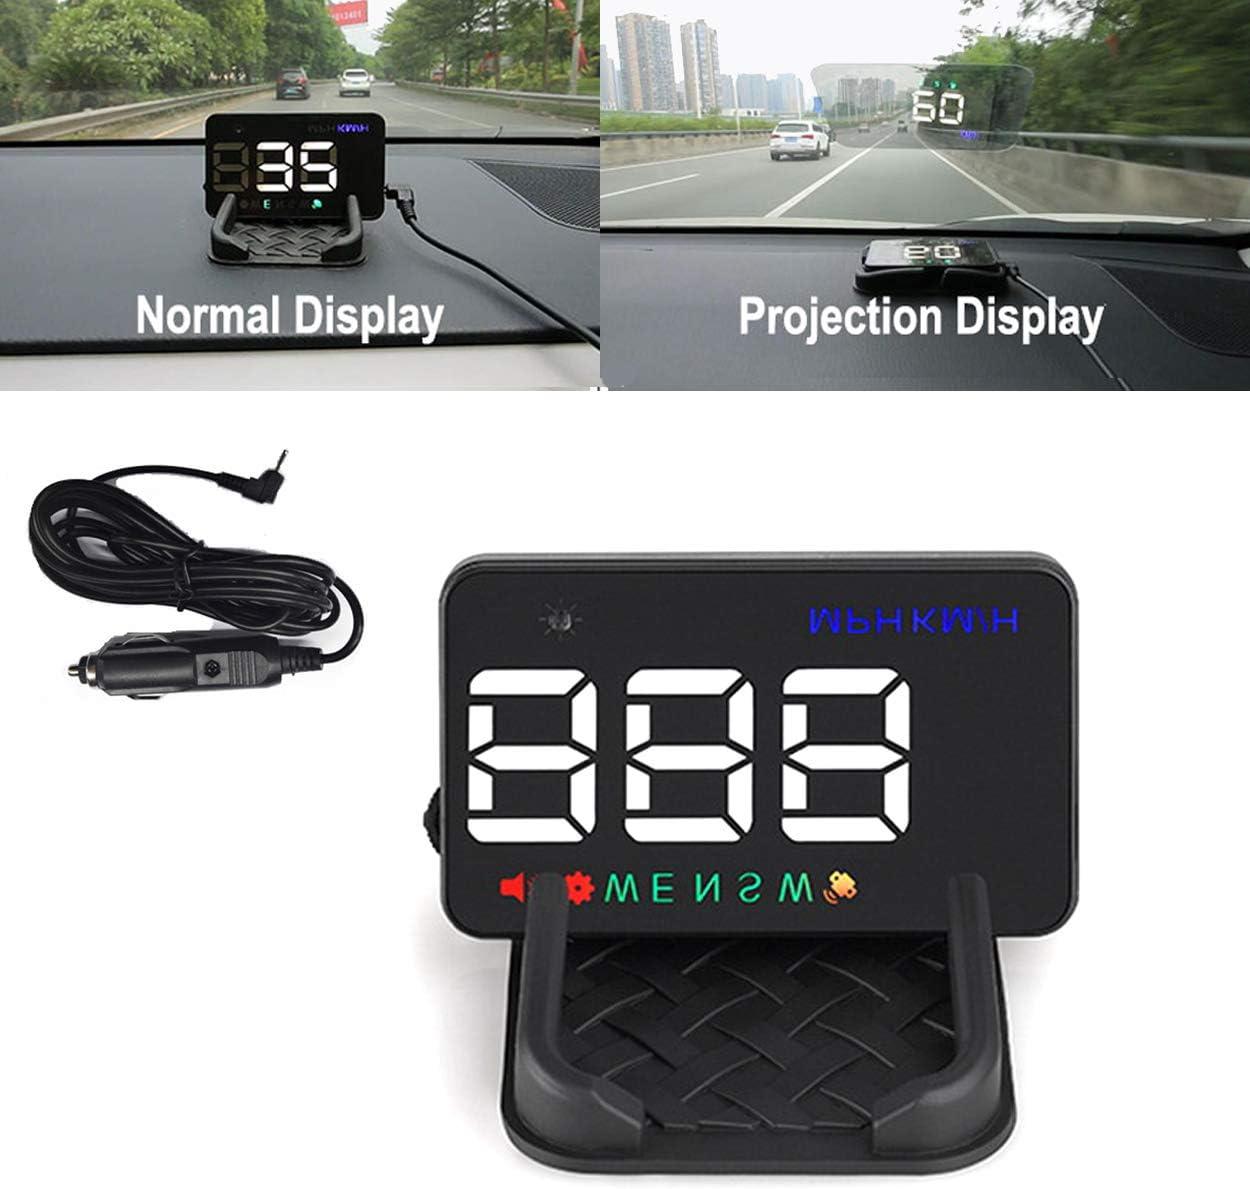 YUGUIYUN HUD Head Up Display para Coche A5, GPS Digital Velocímetro KMH/mph con Función de Alarma Aviso de Velocidad Coche Parabrisas Proyector